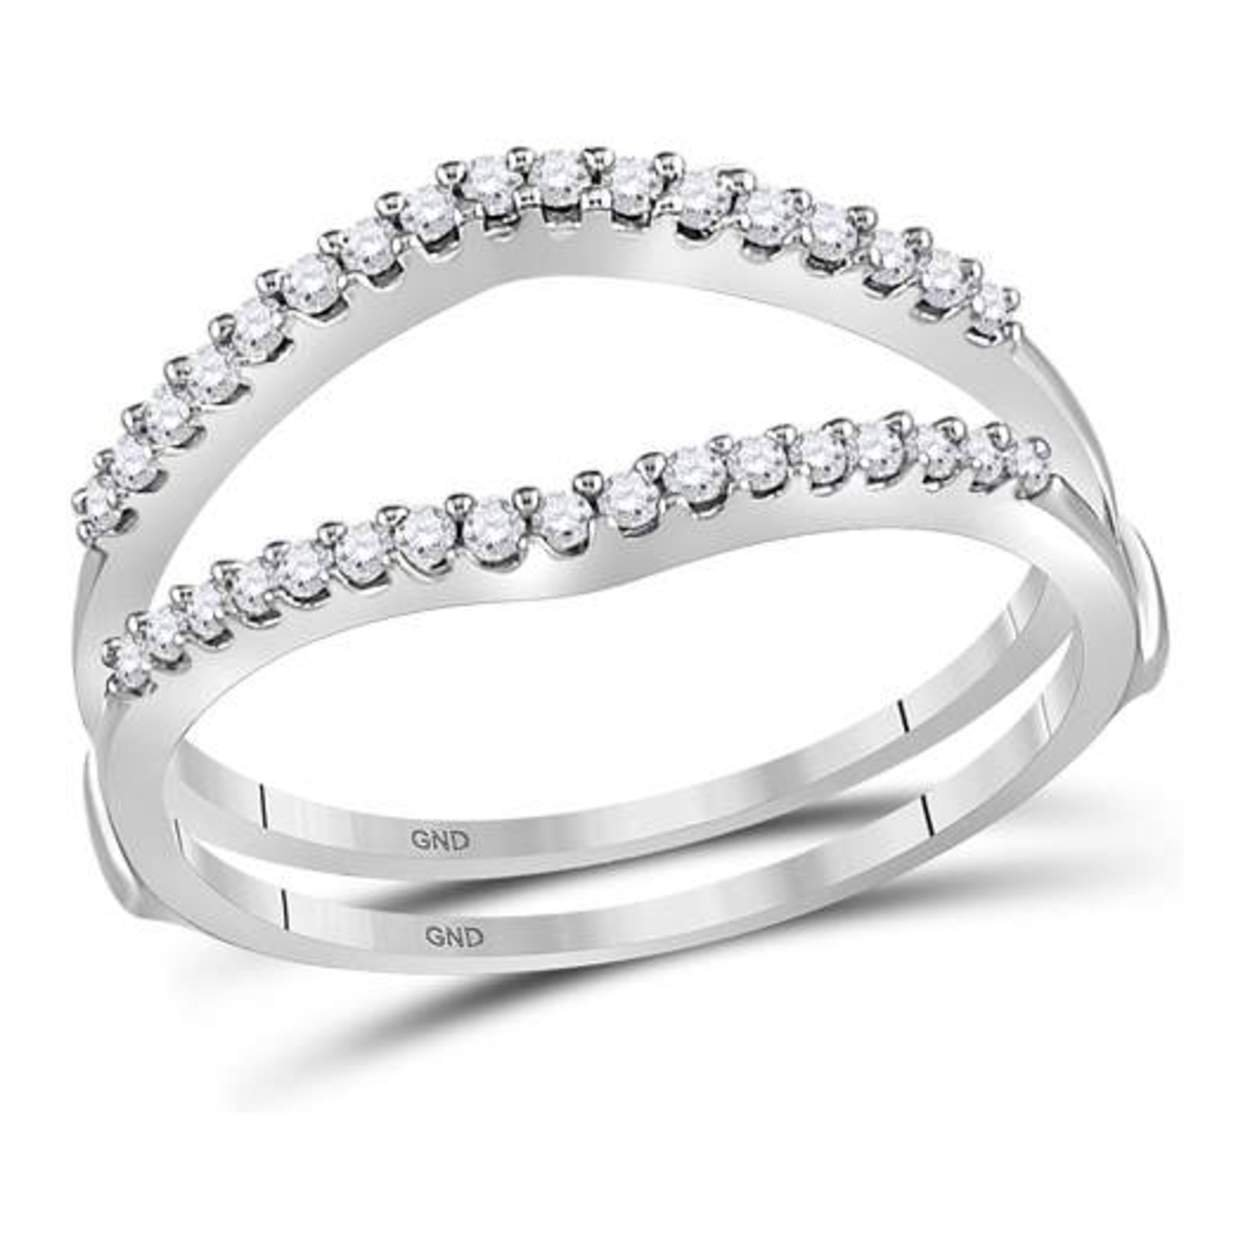 0.25 cttw 14k White Gold 1/4 cttw Real Diamond Ring Guard Wrap Enhancer Wedding Band 8.5mm 14k White Gold Size 6